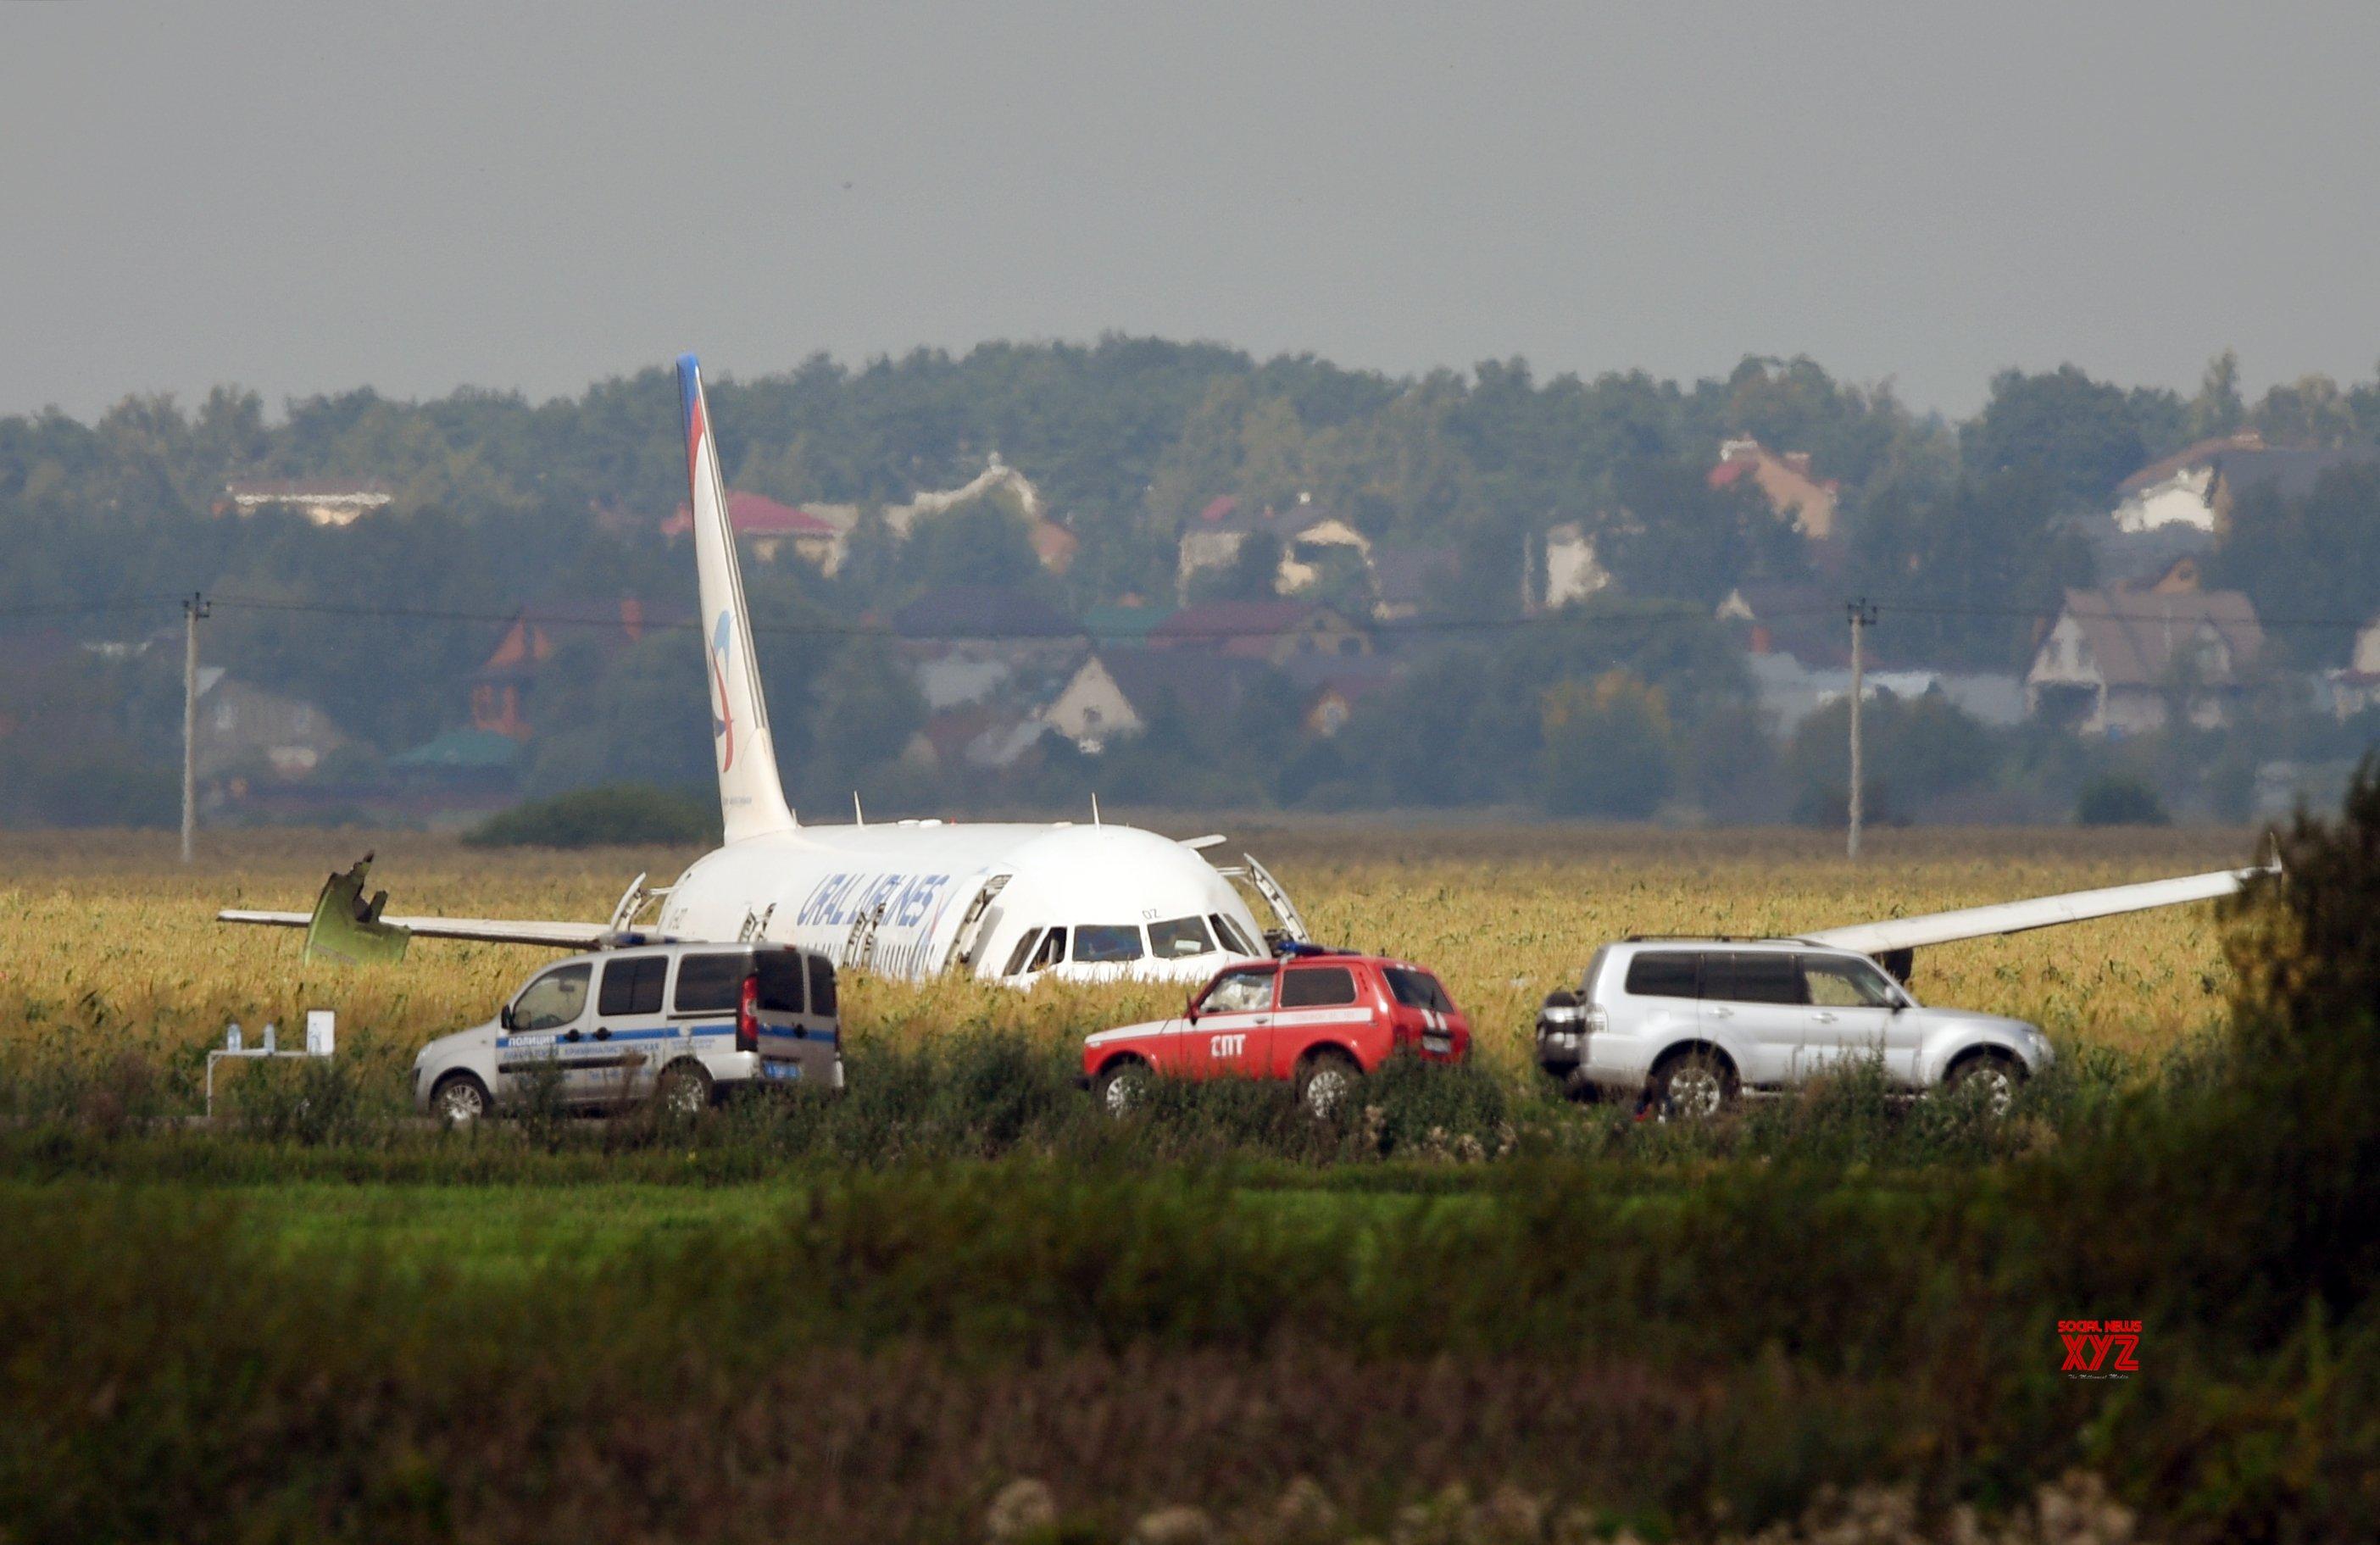 20 hurt as plane makes hard landing in Russia